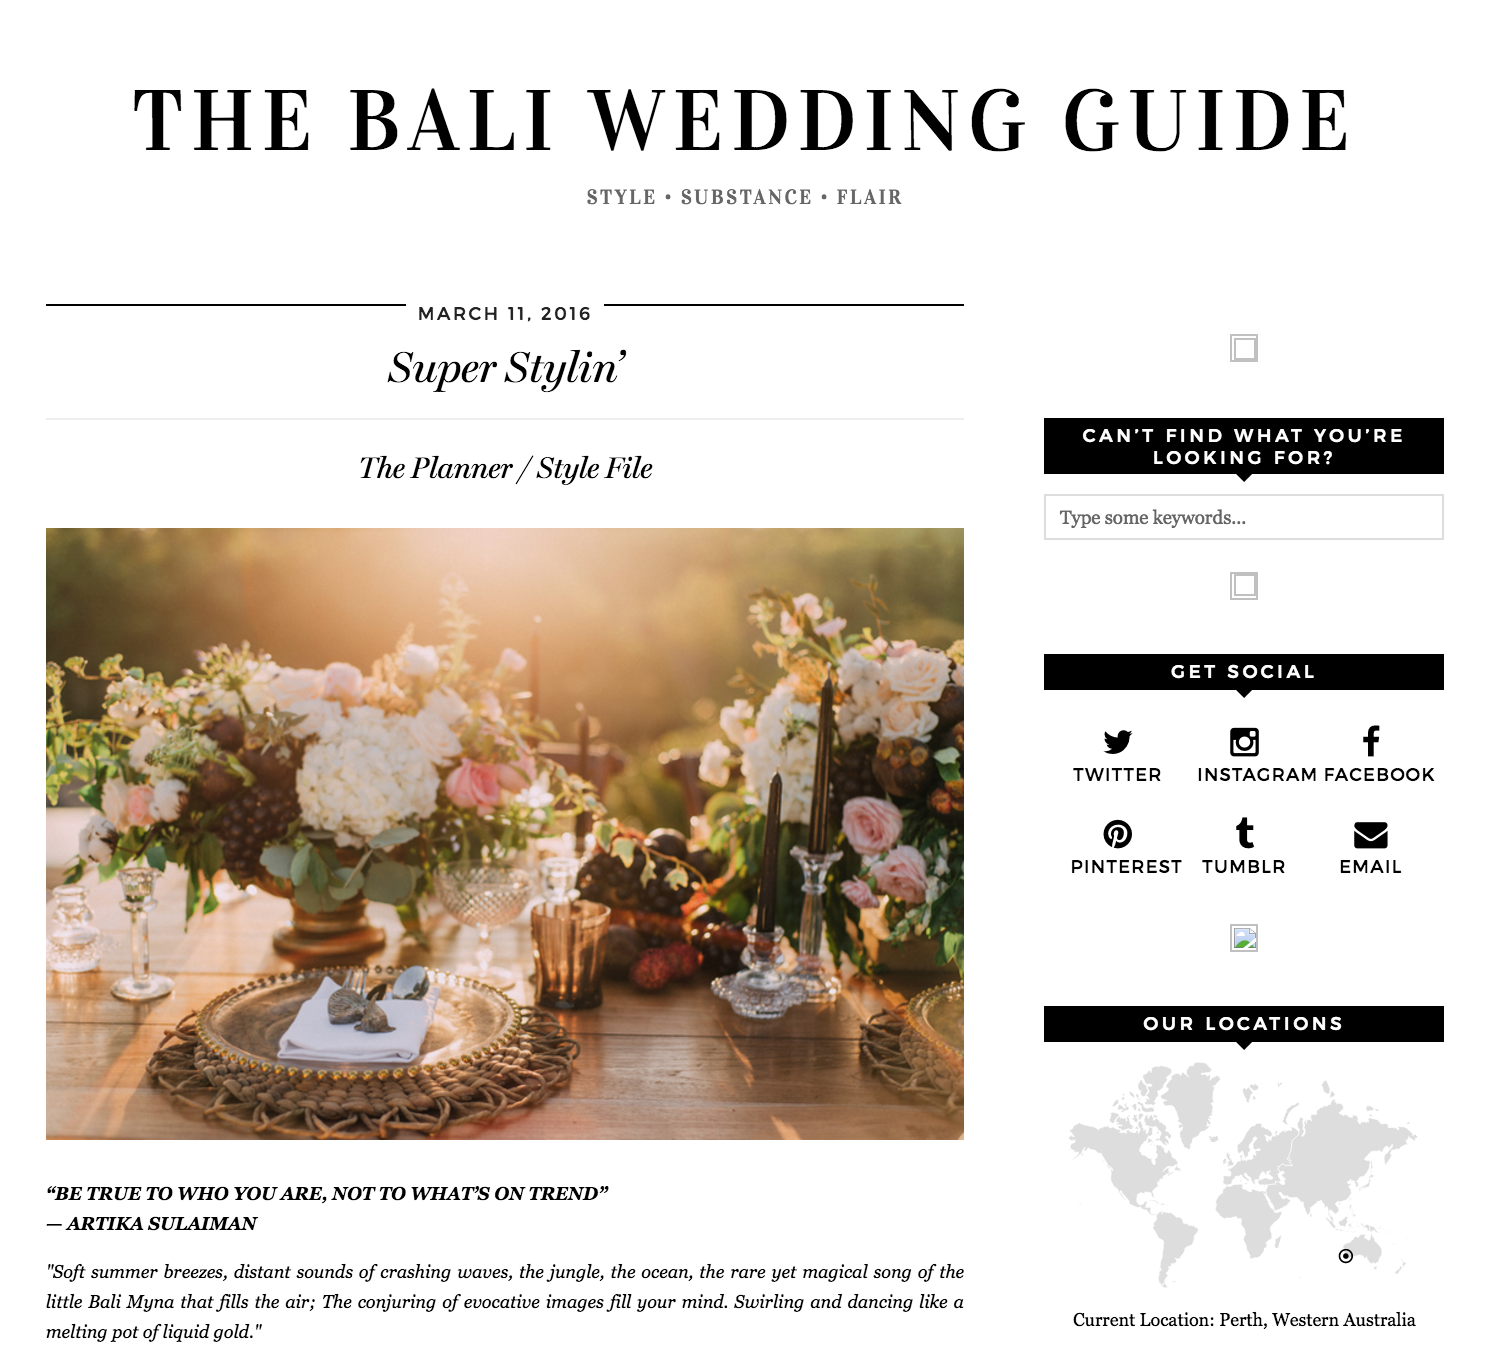 The Bali Wedding Guide